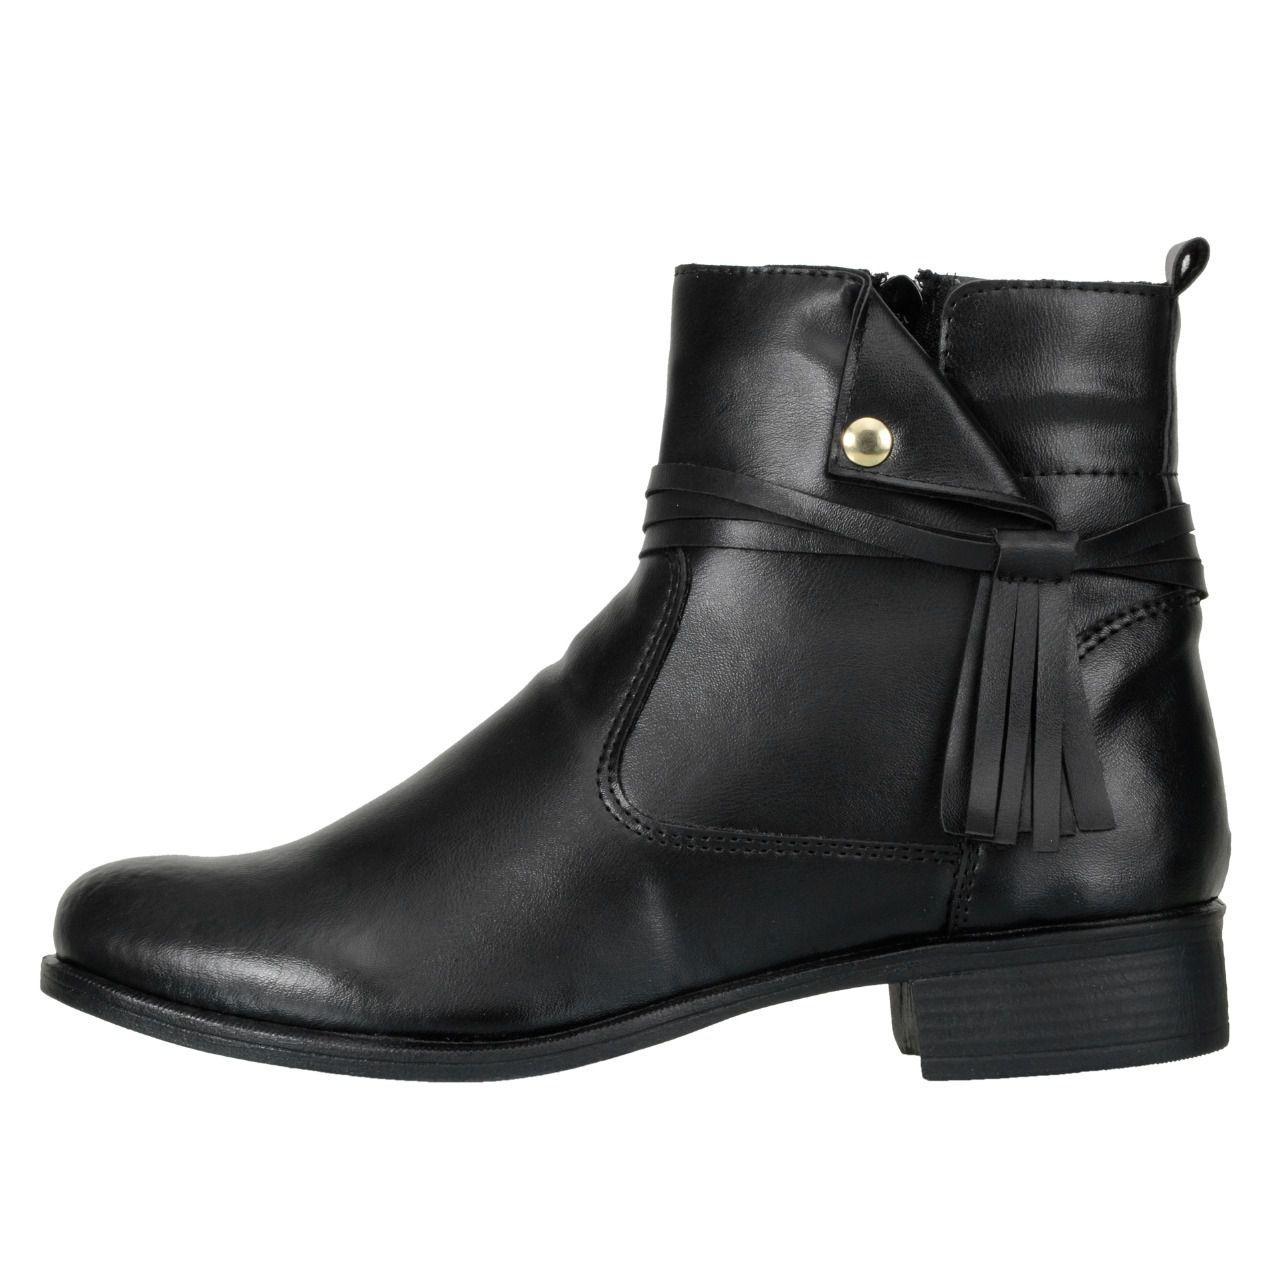 Bota Cano Curto DuduDias Ankle Boot 070 Couro - Marrom e Preto